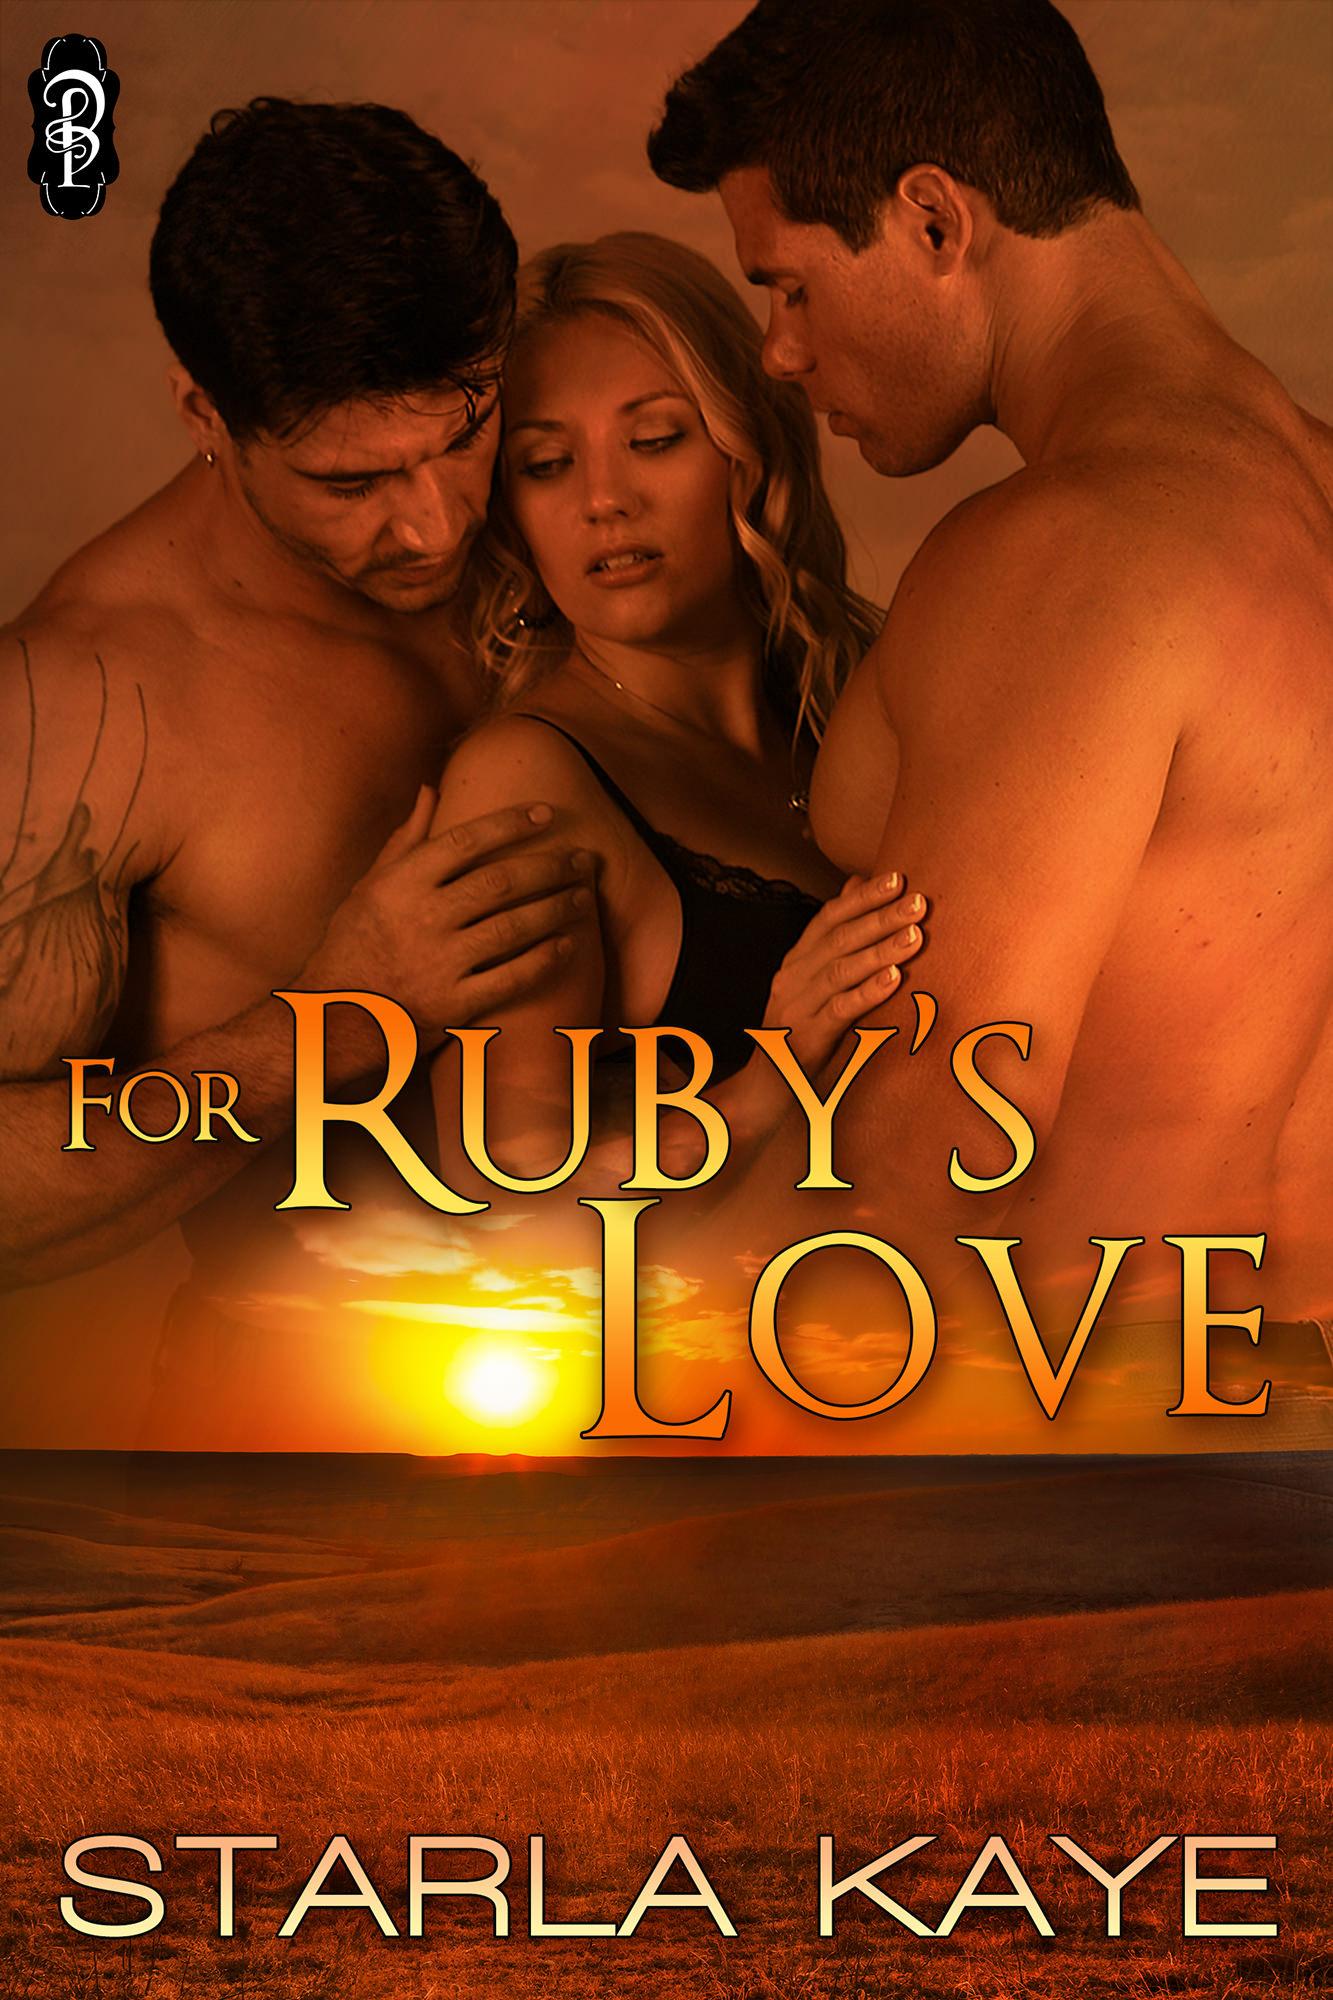 For Ruby's Love-1333x2000.jpg